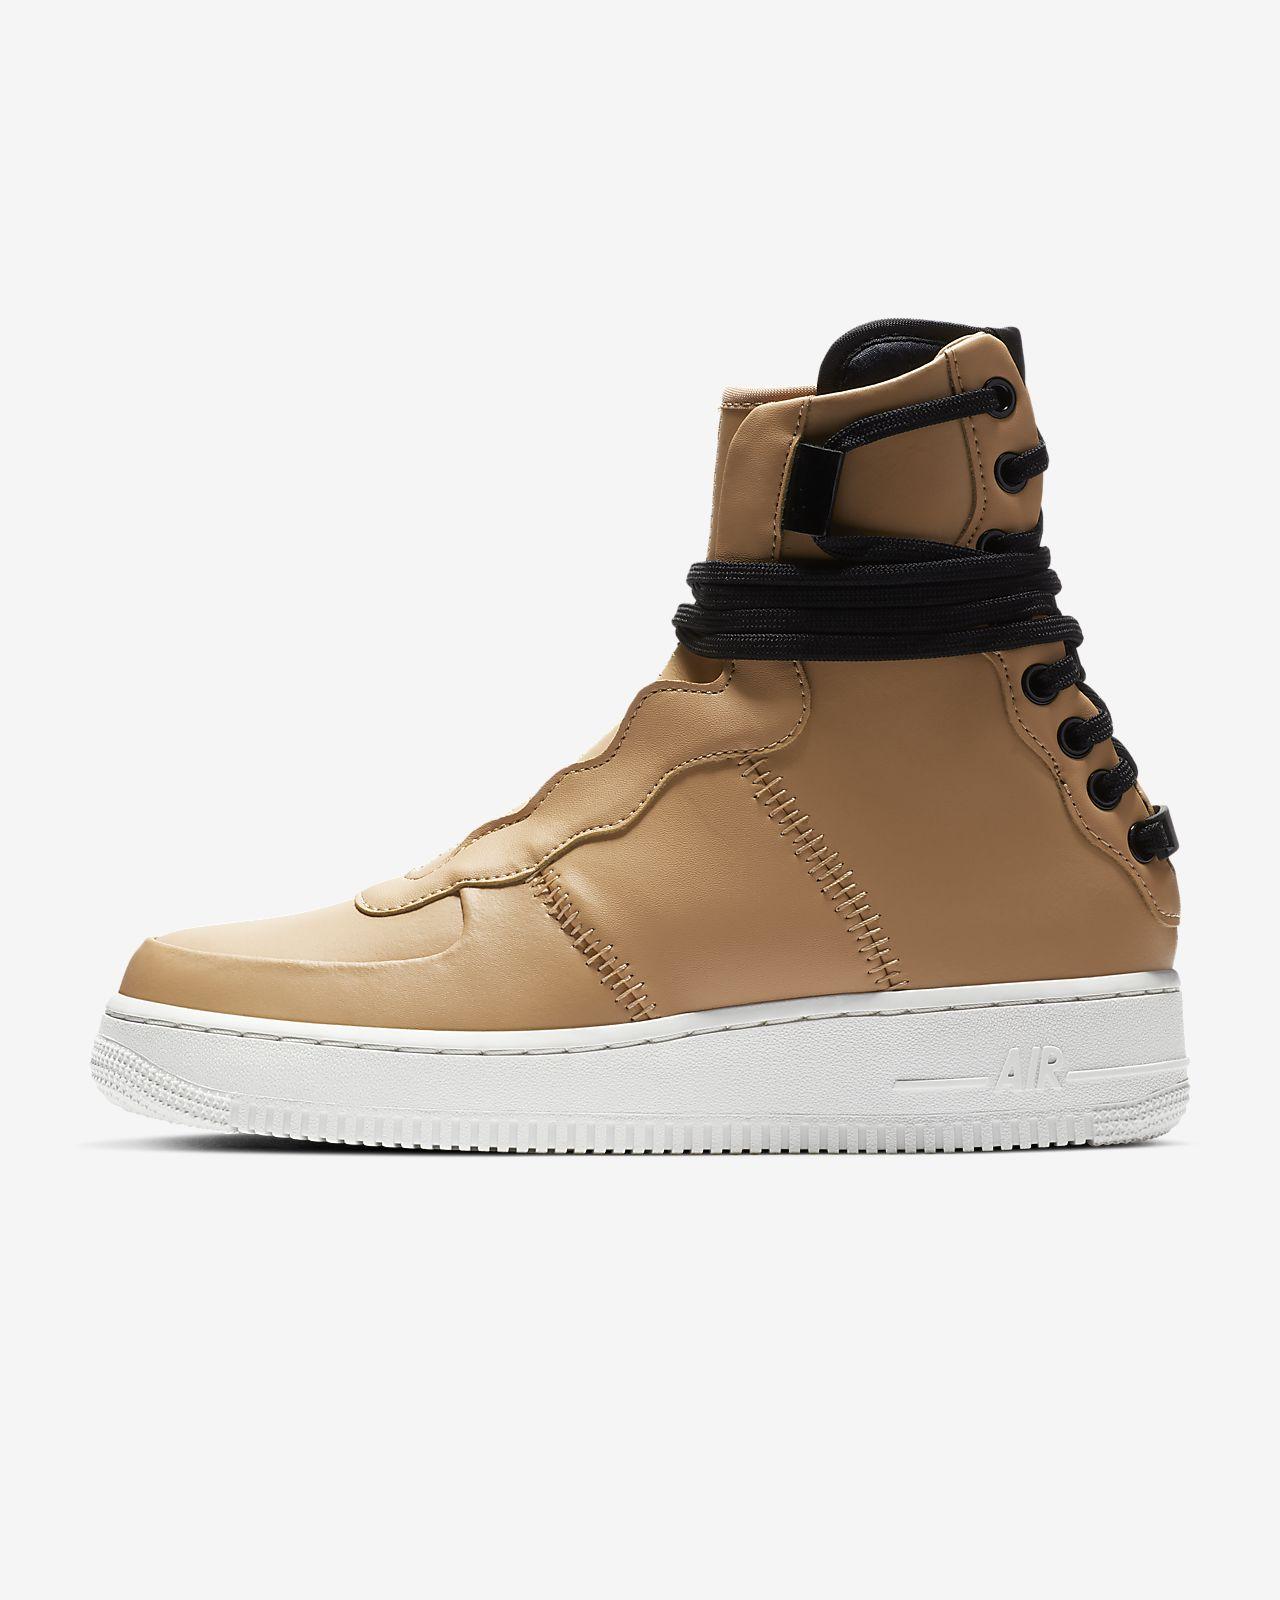 Sko Nike AF1 Rebel XX för kvinnor